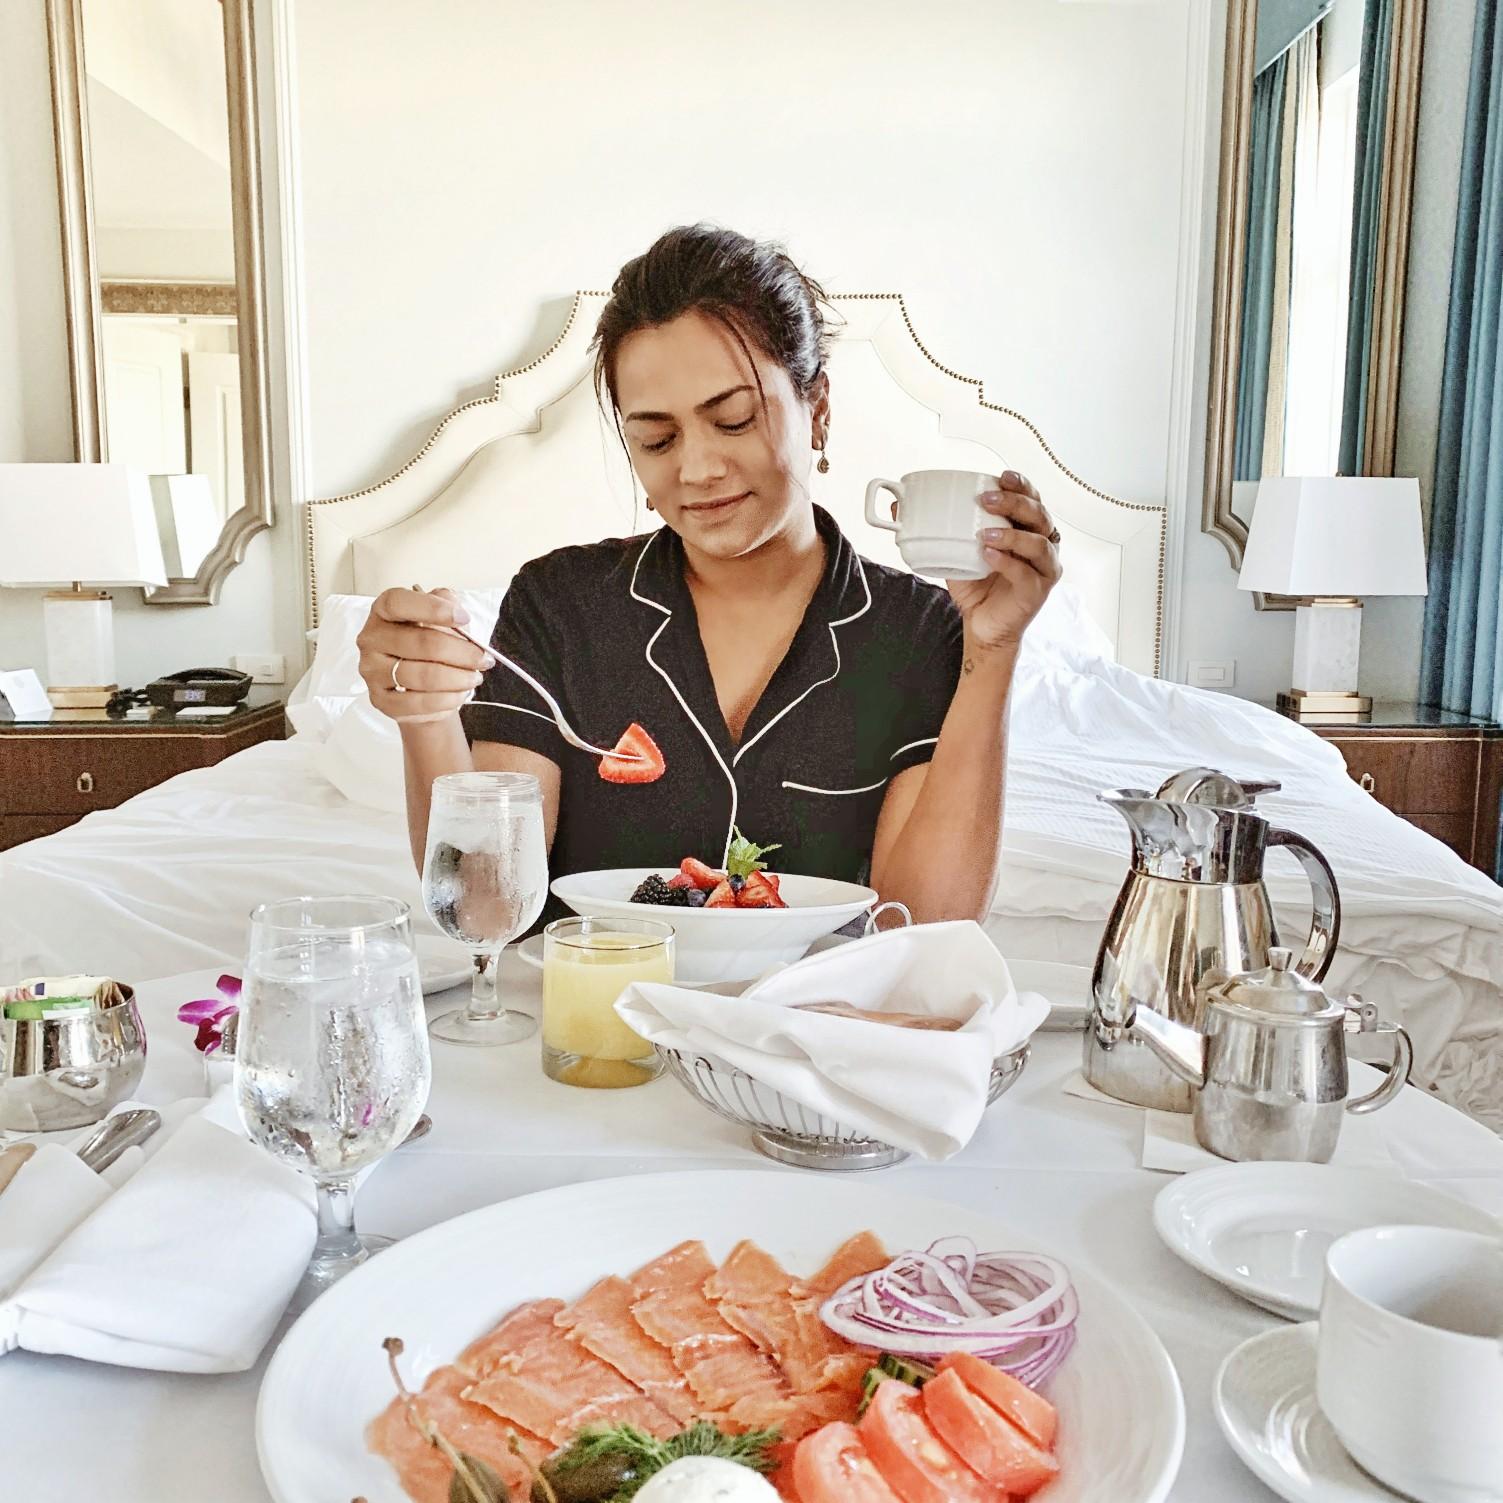 Miami Lifestyle & Travel Blogger Afroza Khan